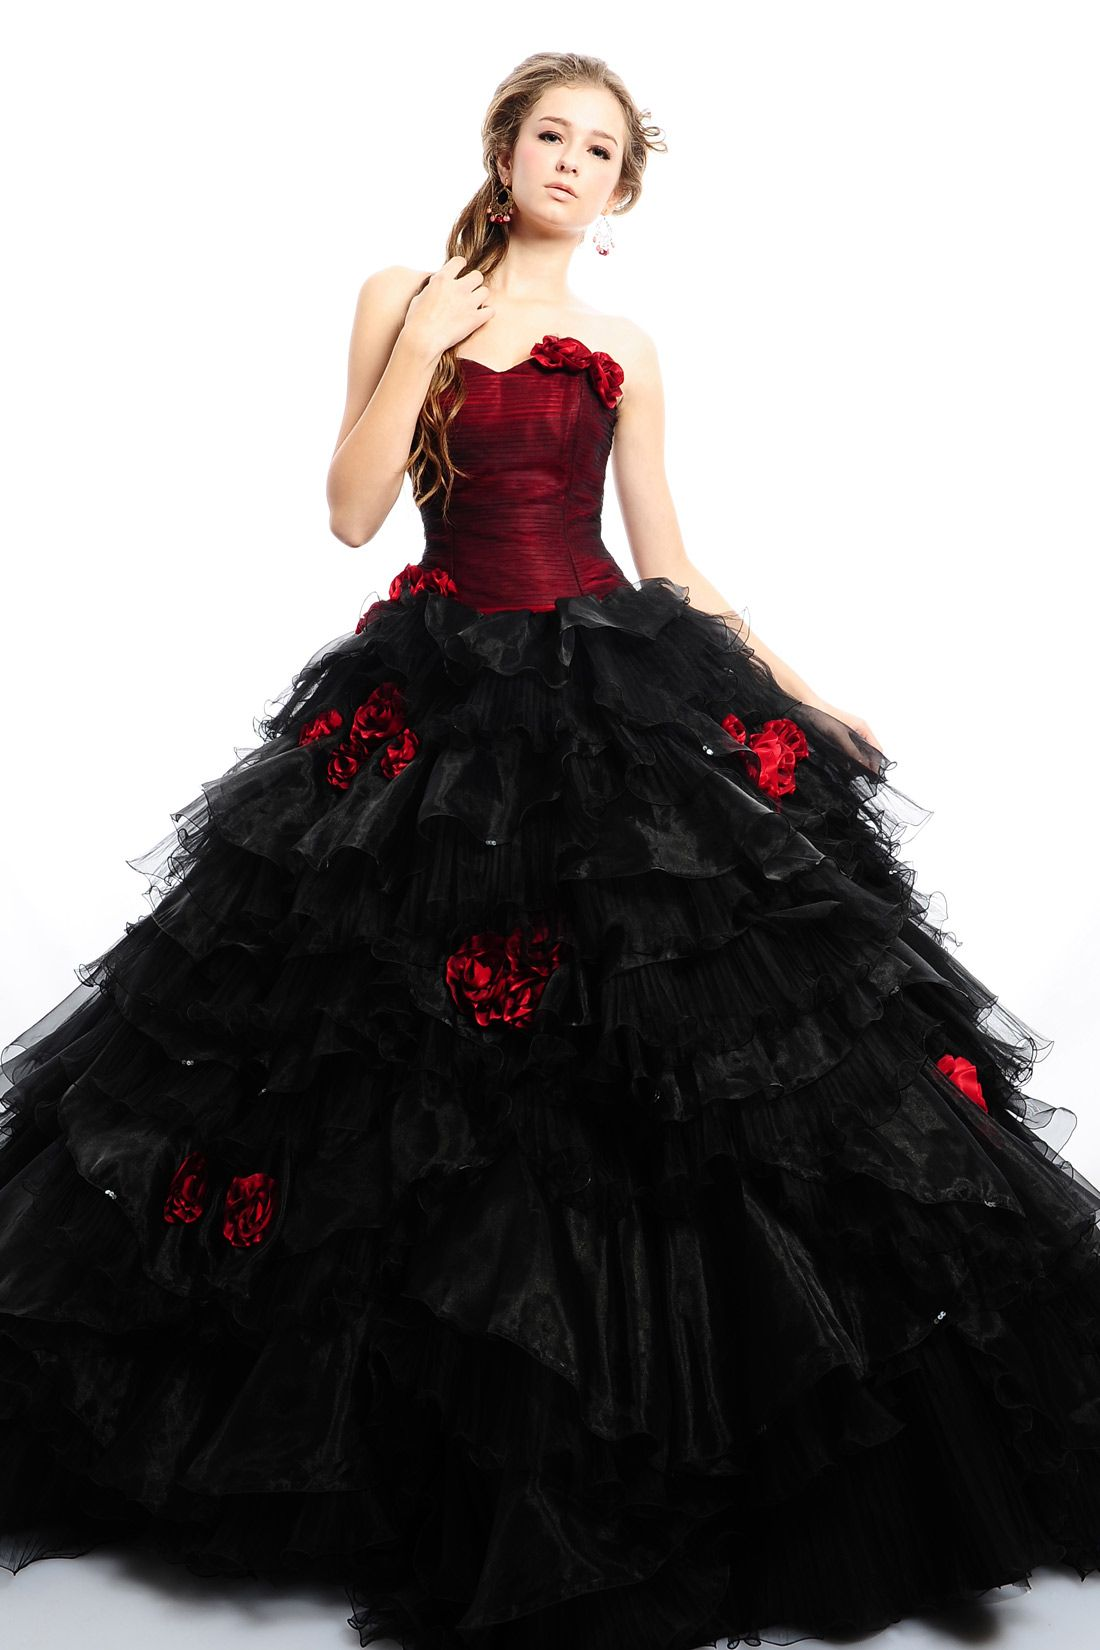 20 Vizcaya Quinceanera Dresses - Complete Guide | Quince dresses ...